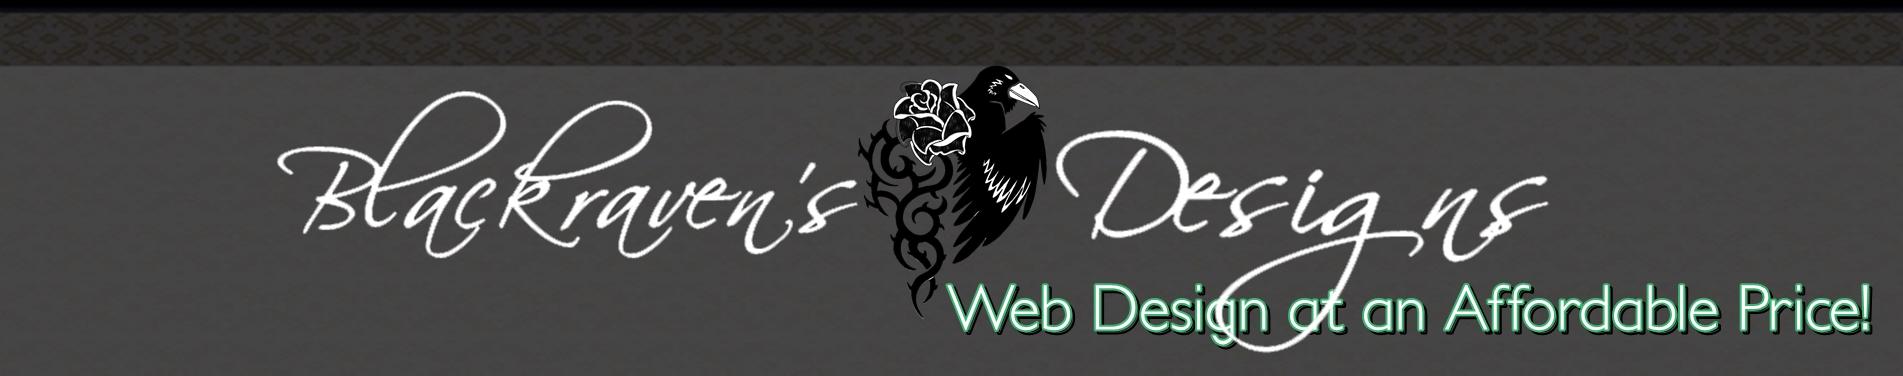 Blackravens Designs